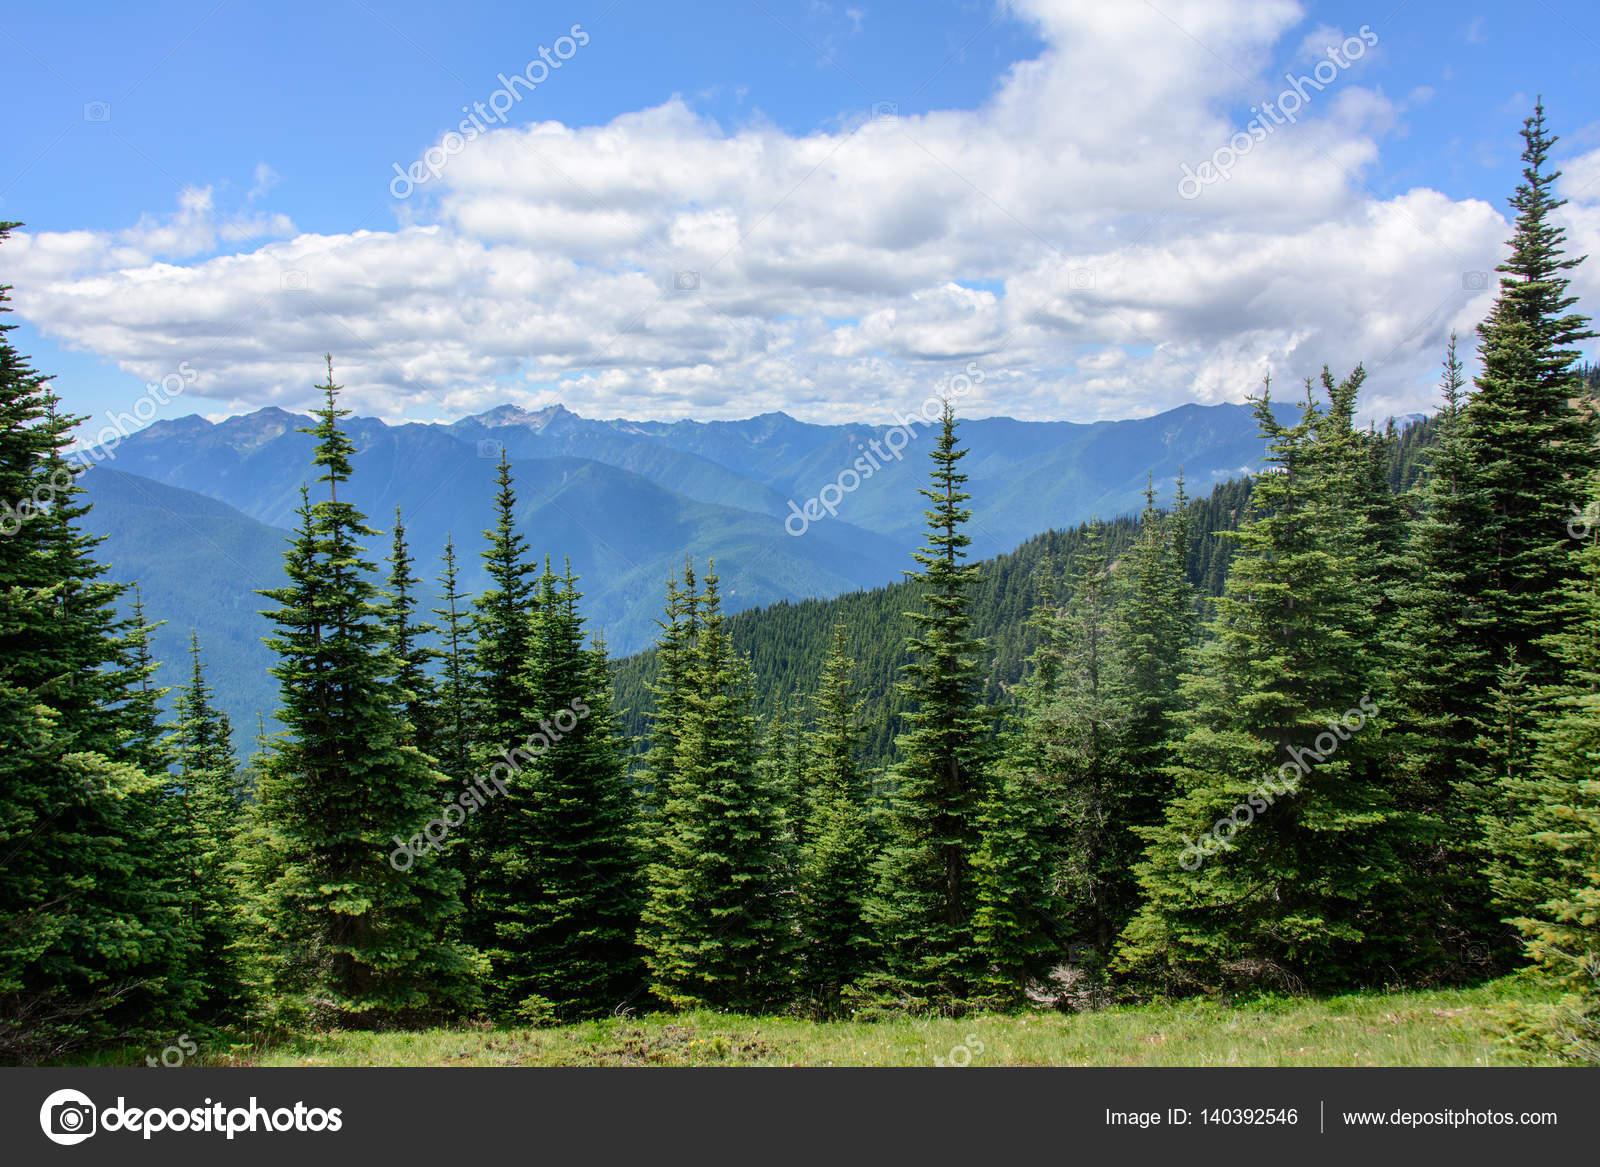 Lesnoj Pejzazh V Gorah Olimpijskij Nacionalnyj Park Shtat Vashington